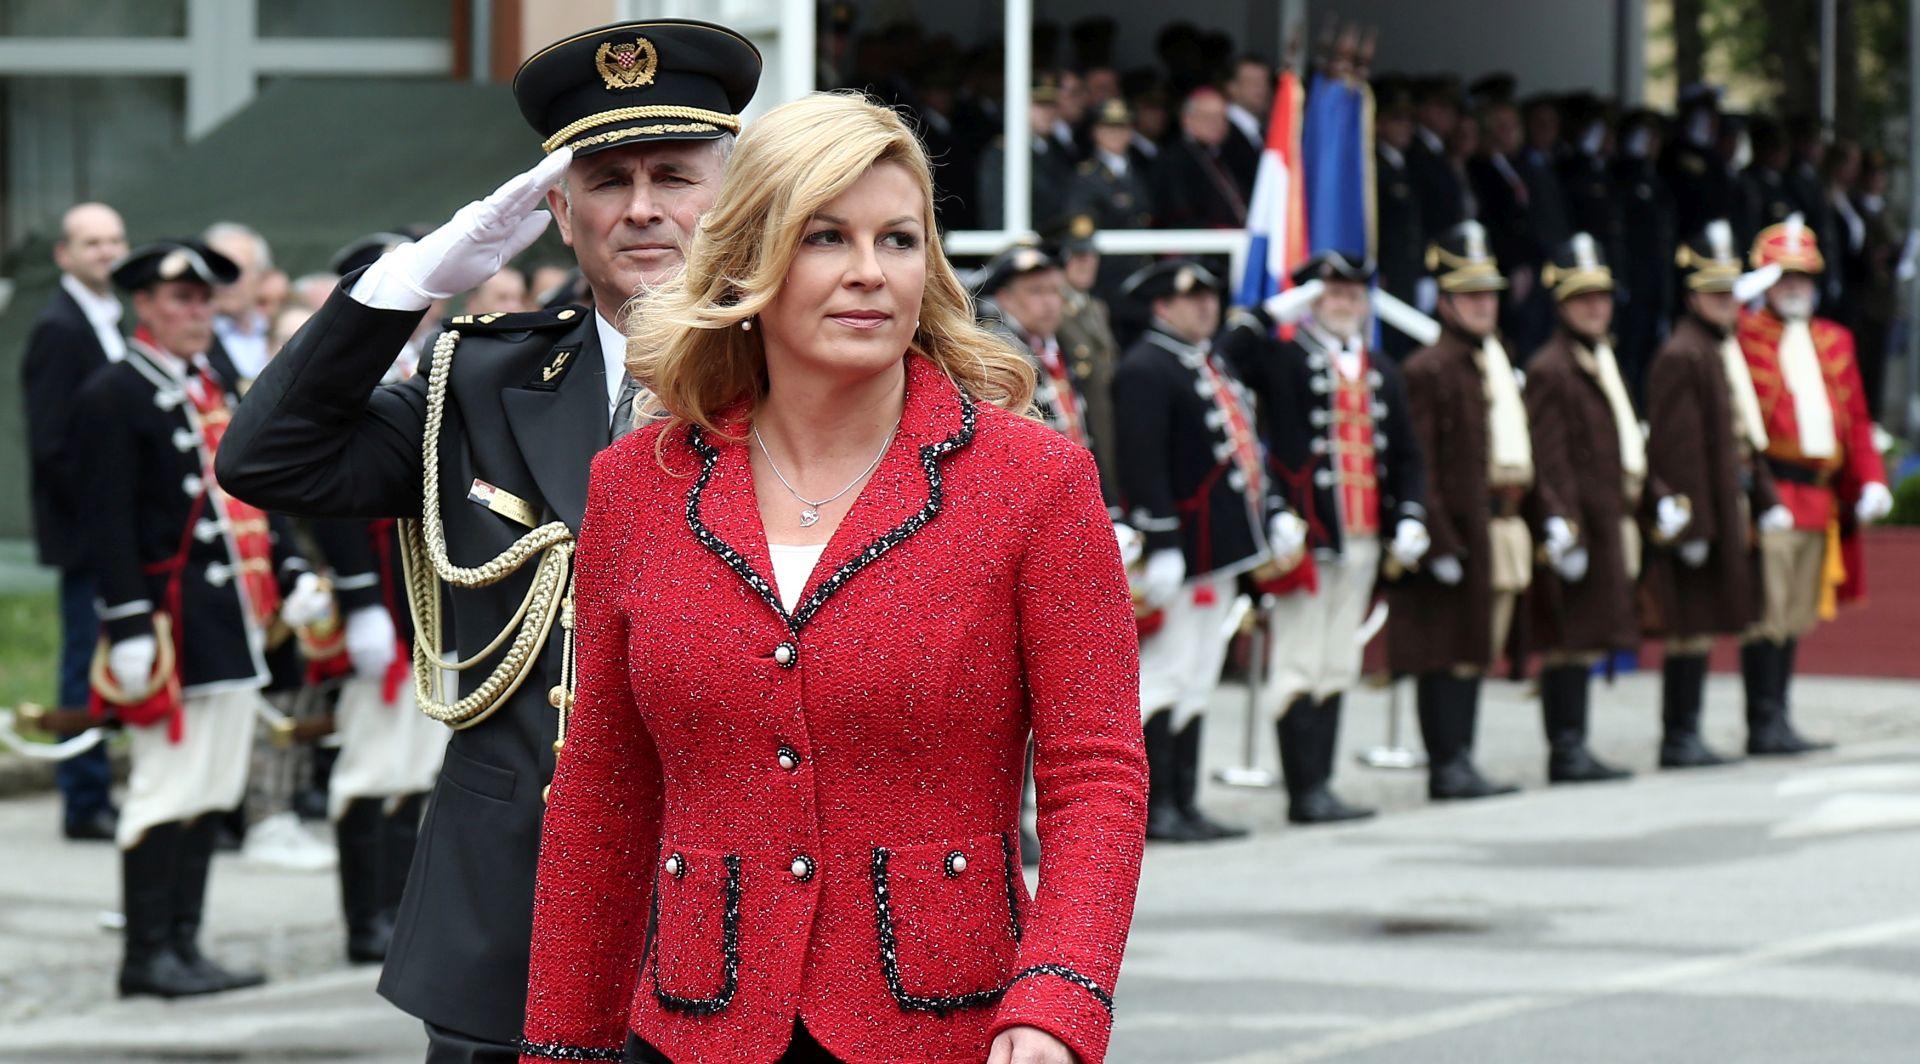 Predsjednica čestitala Dana Oružanih snaga i Dana Hrvatske kopnene vojske i 26. obljetnice ustrojavanja OS RH